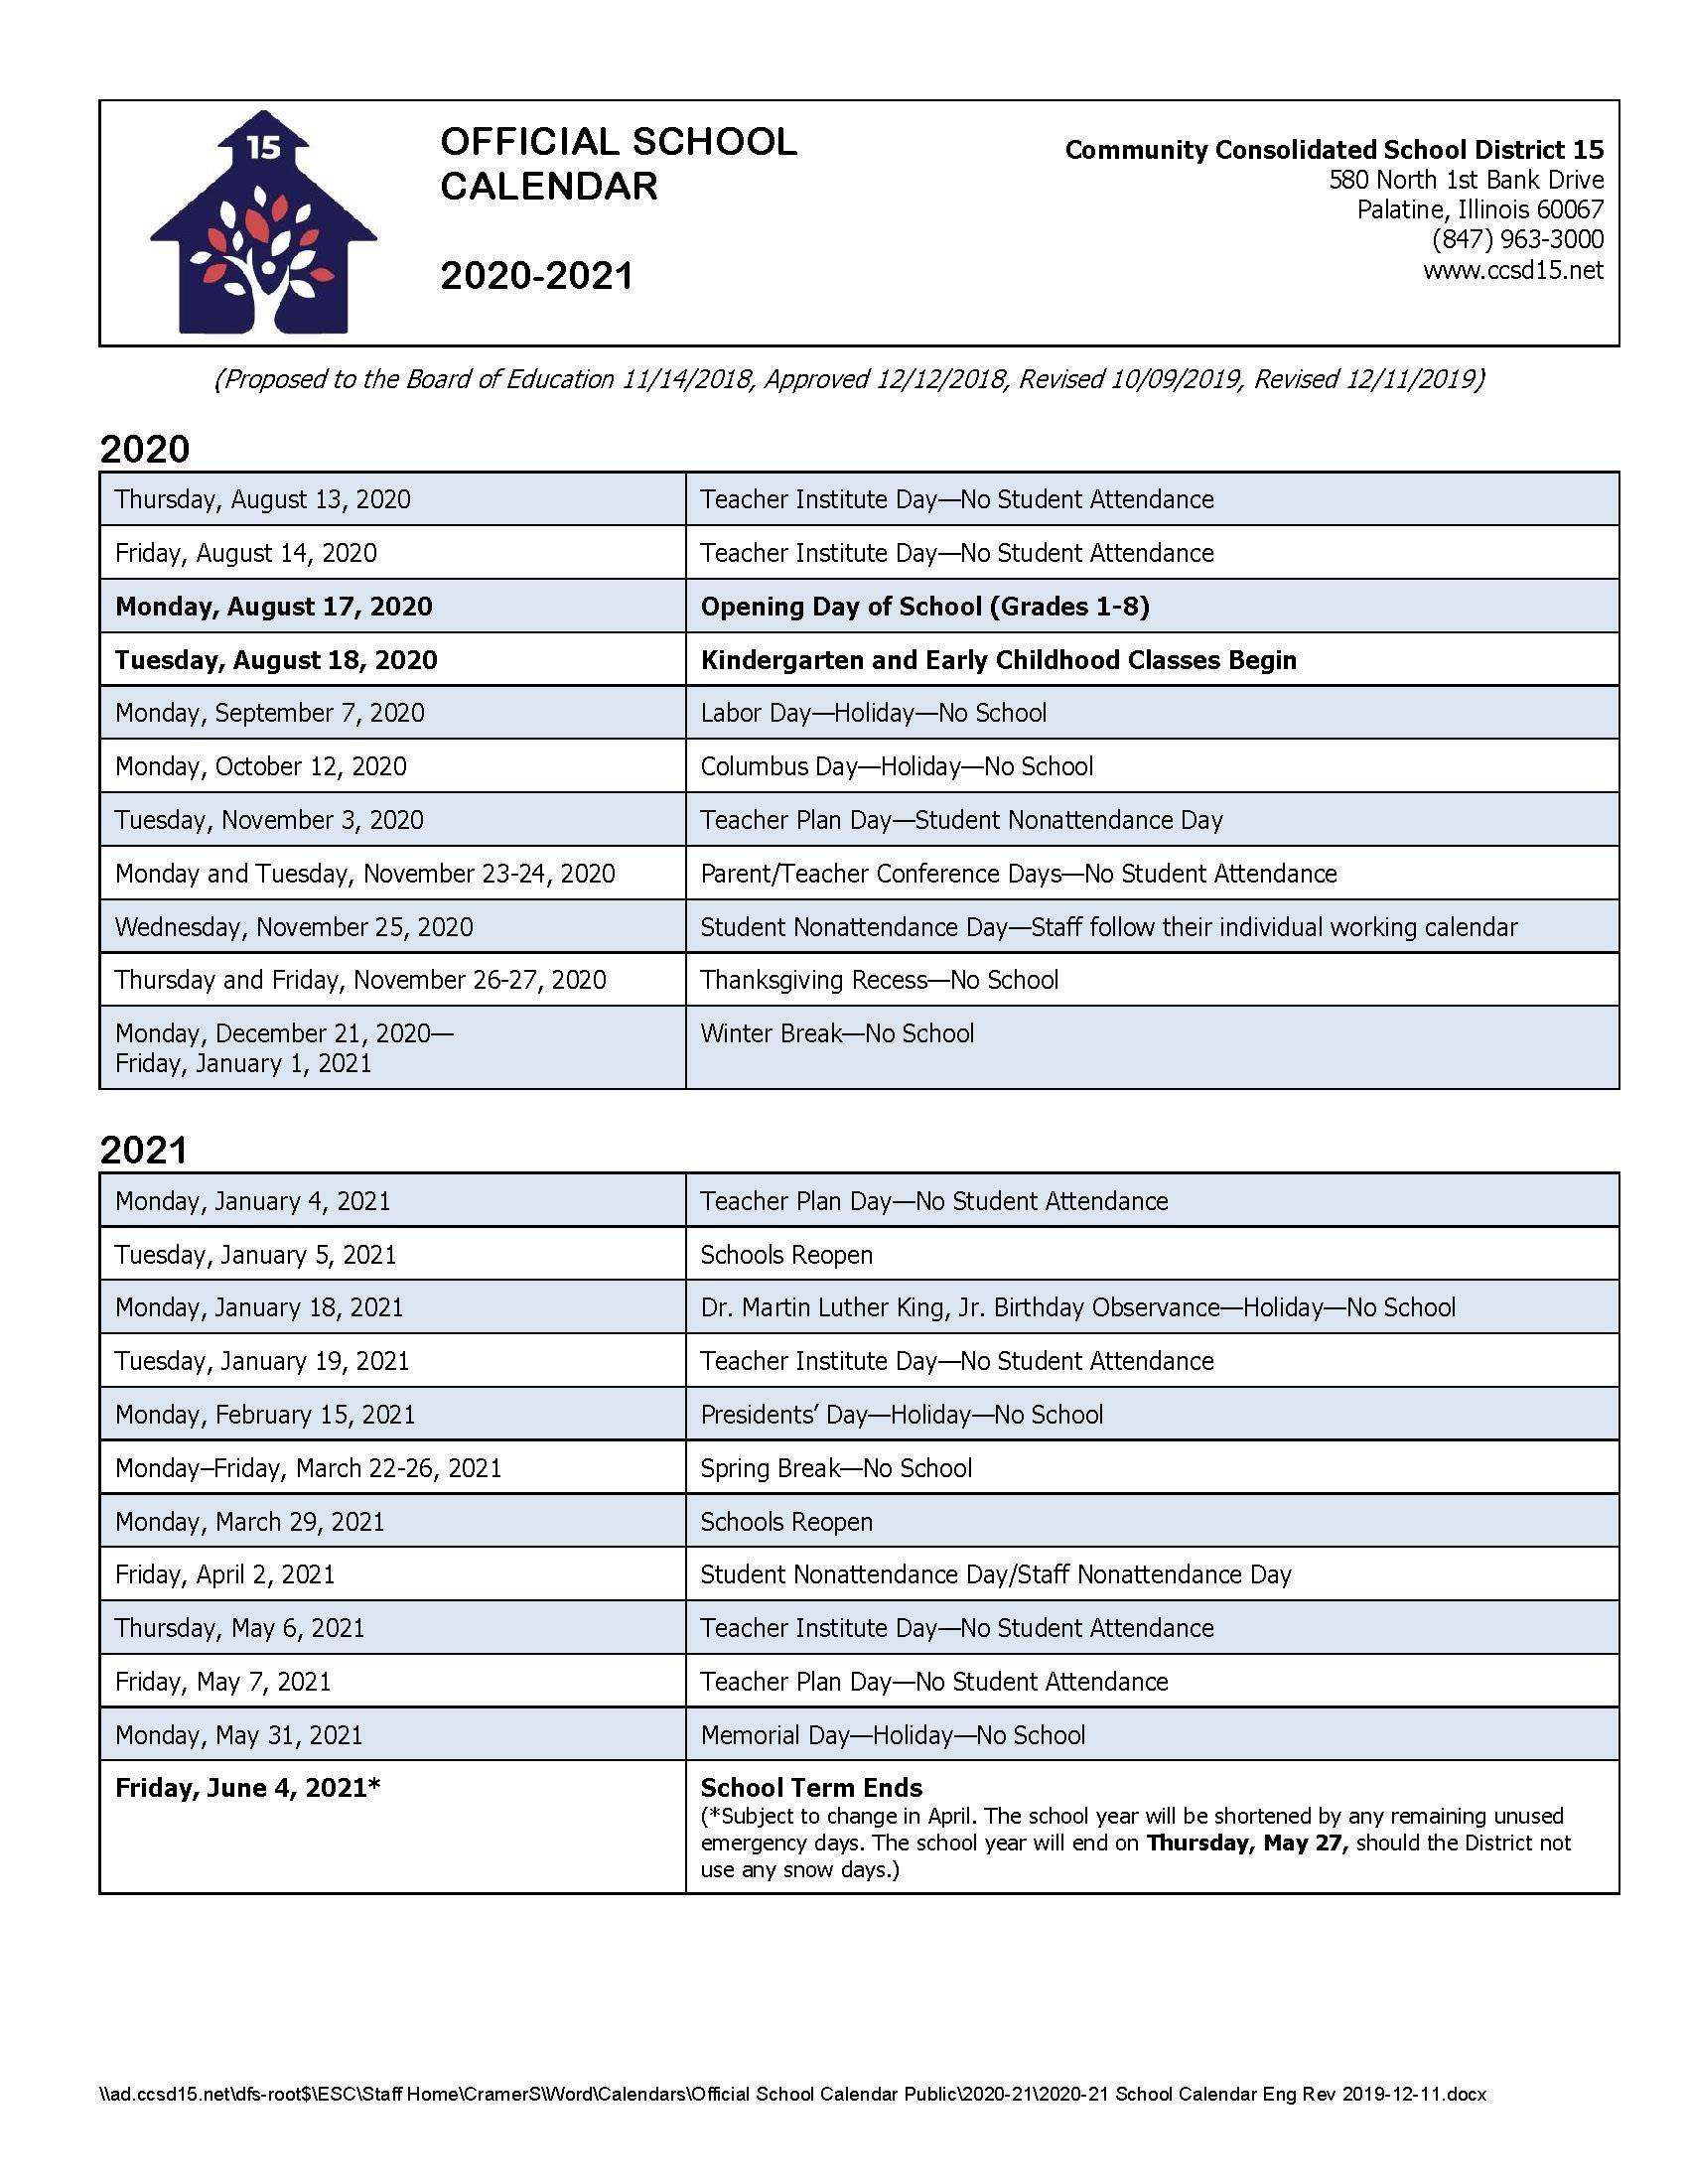 Calendars / 2020 21 Official School Calendar Intended For 2021 2021 East Meadow School District Calendar